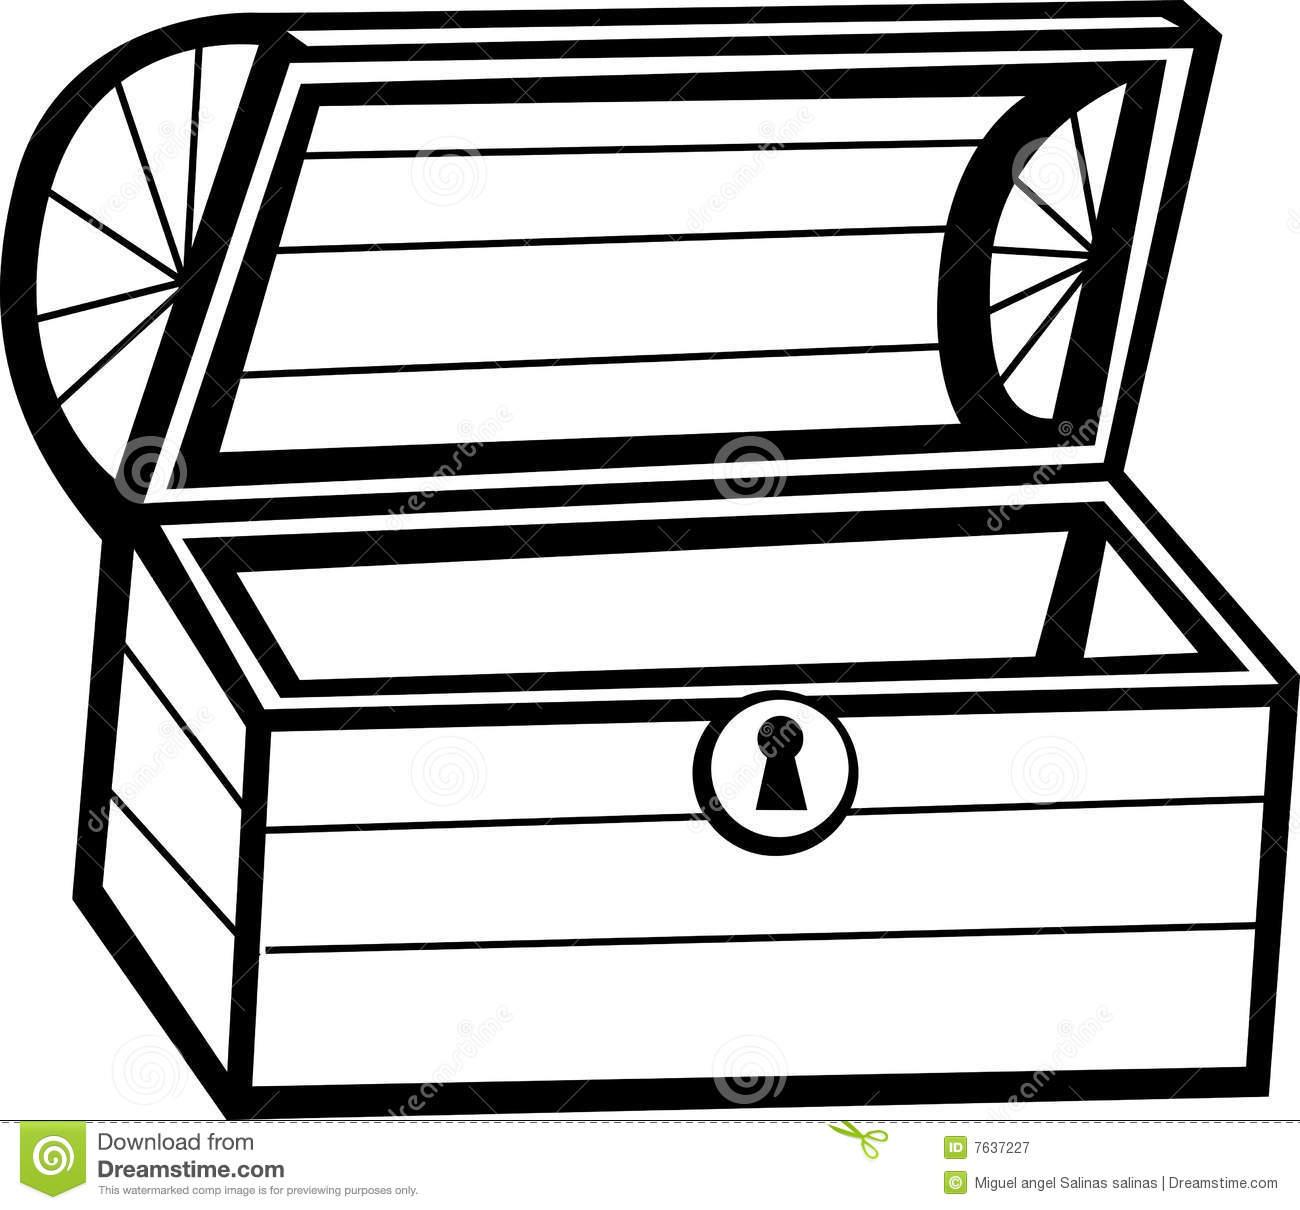 Empty open treasure chest clipart black and white vector transparent library Pirate Treasure Chest Drawing | Free download best Pirate Treasure ... vector transparent library